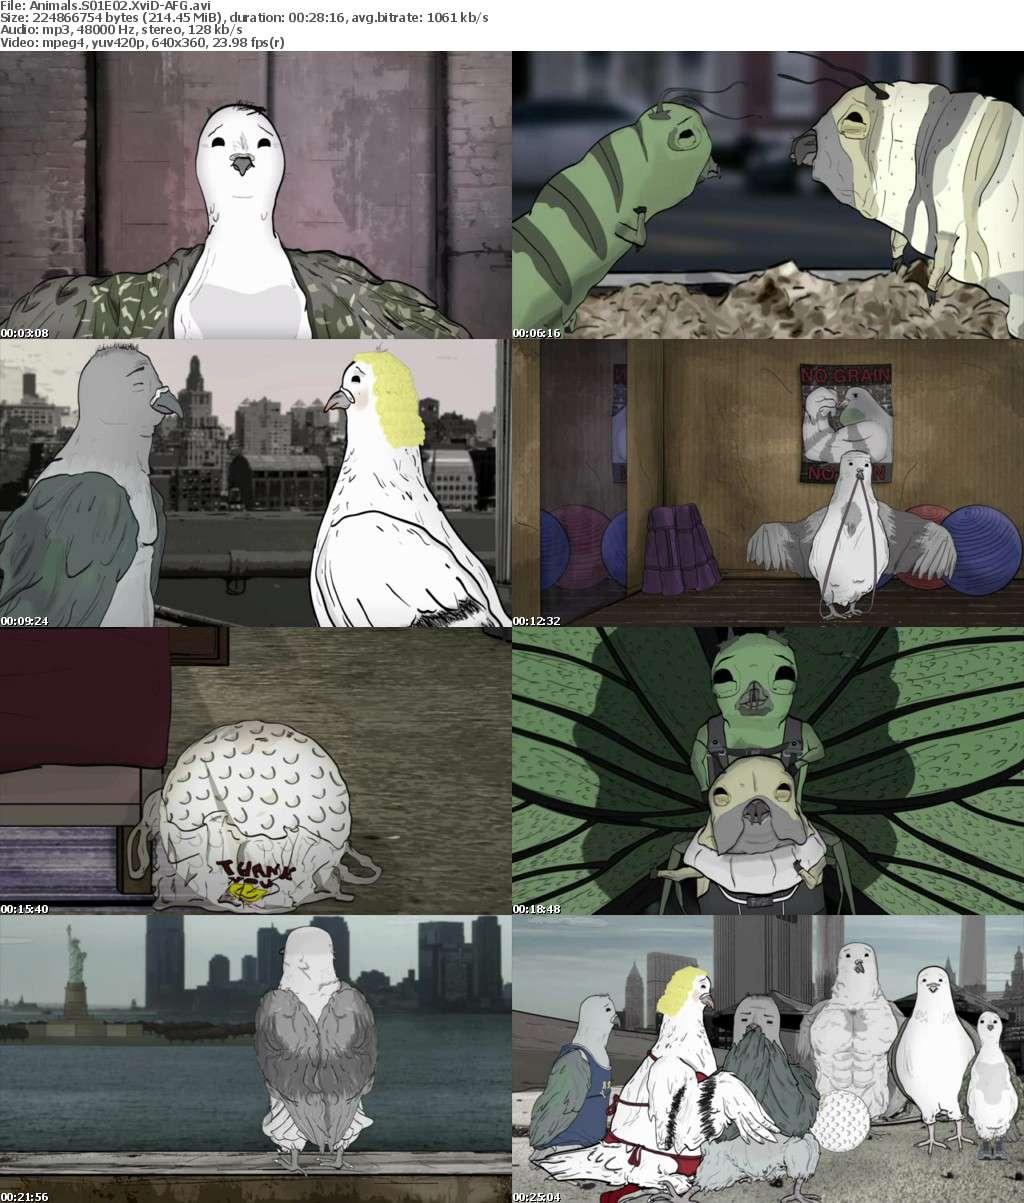 Animals S01E02 XviD-AFG